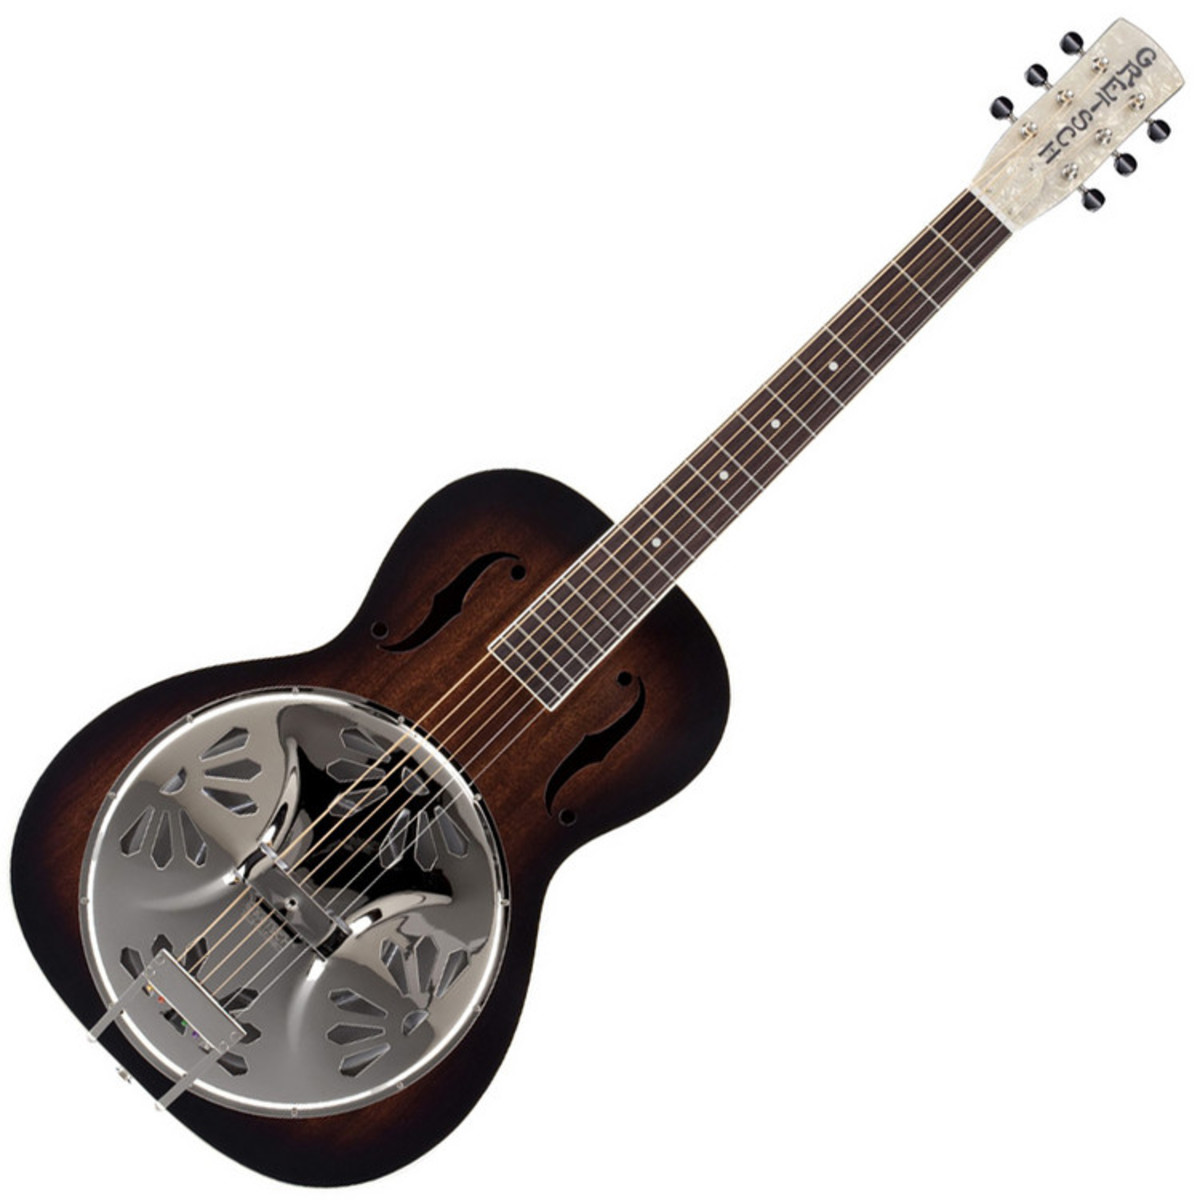 gretsch g9220 bobtail deluxe resonator guitar round neck sunburst at. Black Bedroom Furniture Sets. Home Design Ideas